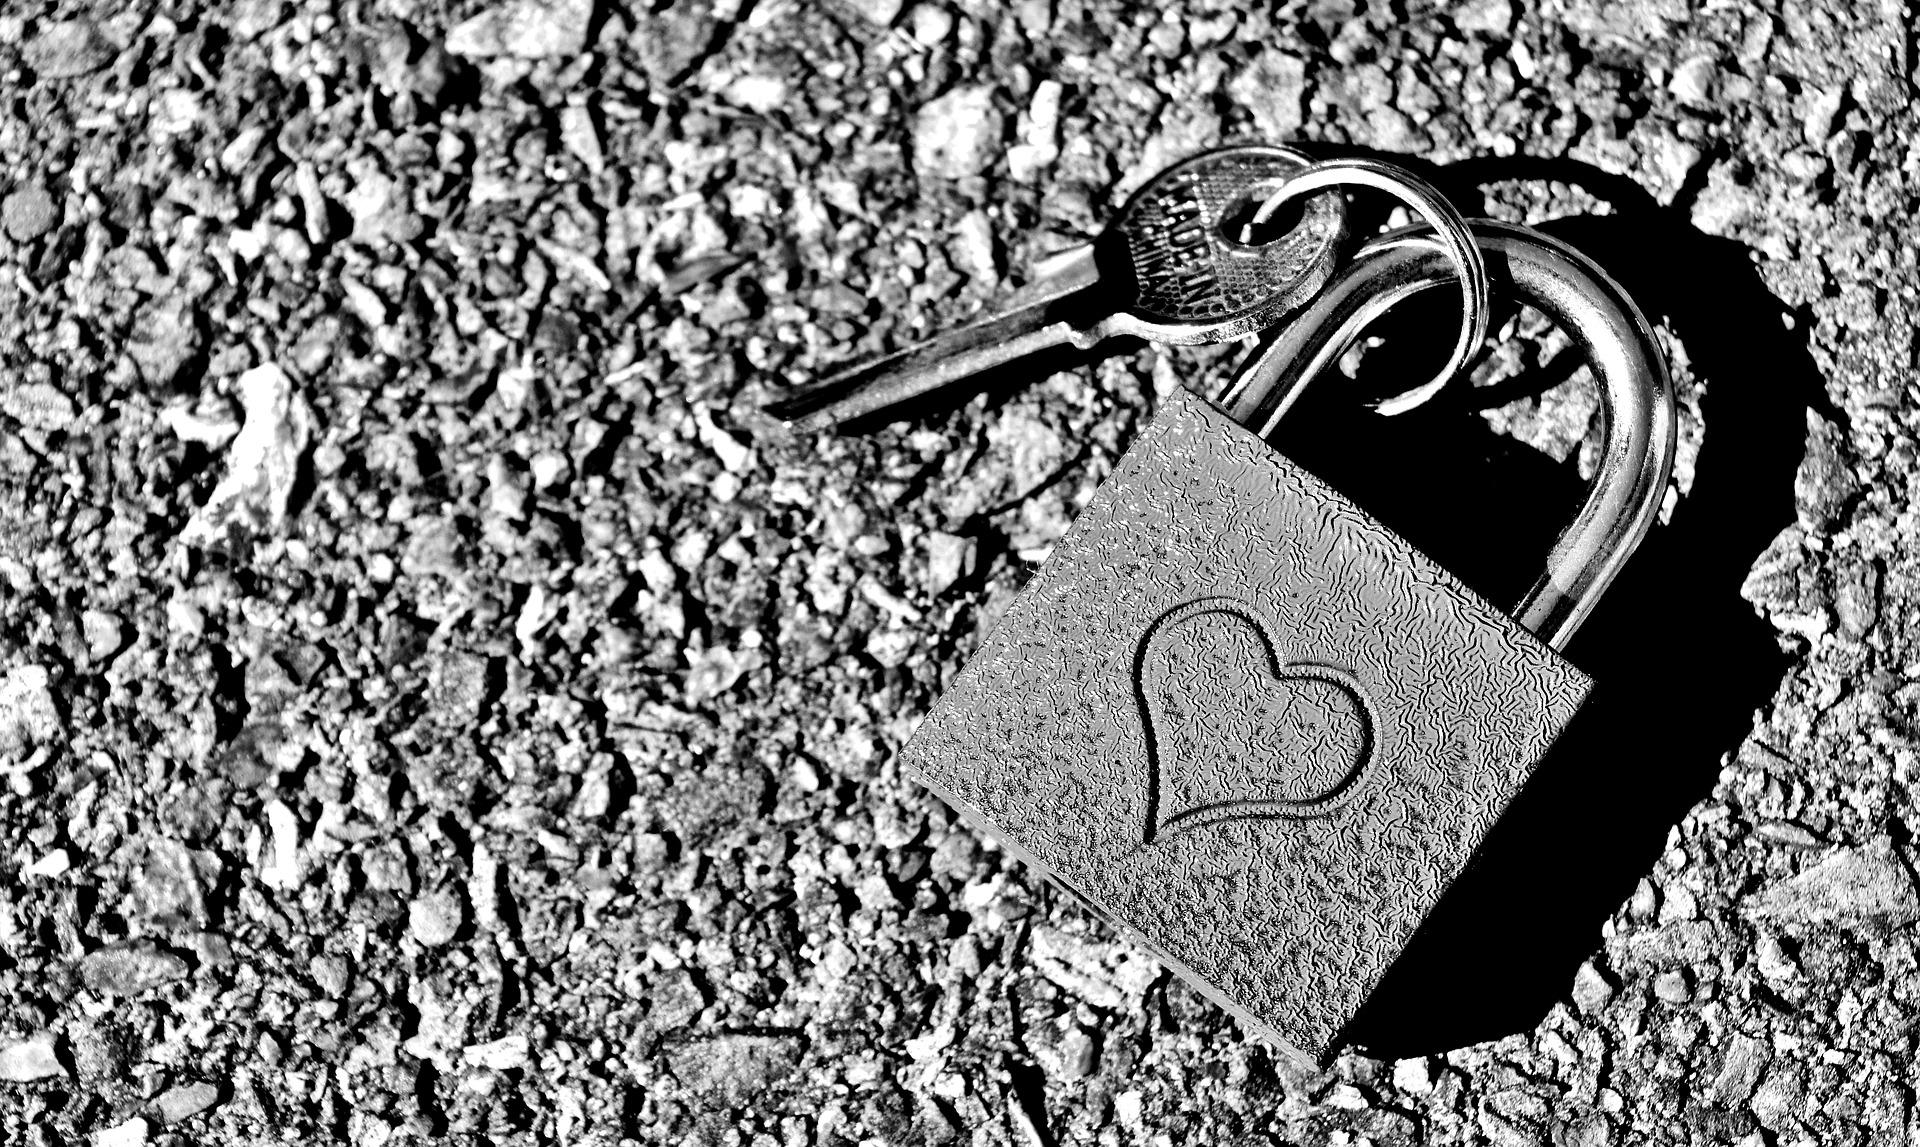 key-to-the-heart-2509704_1920.jpg